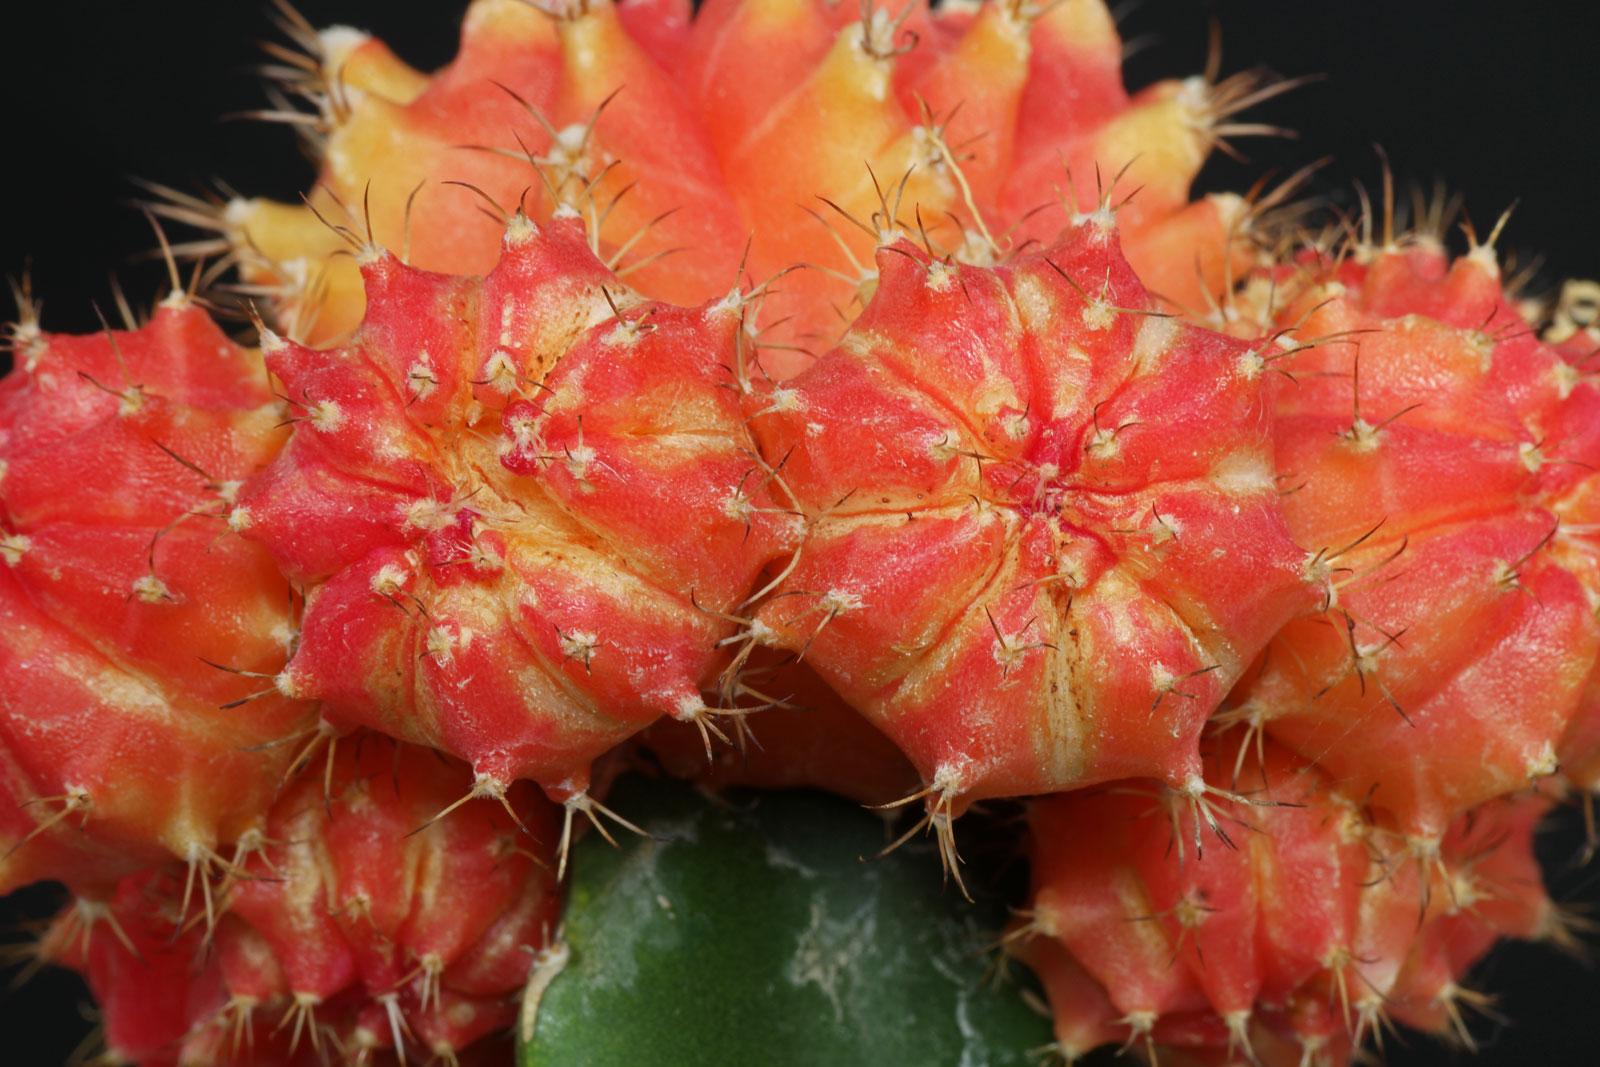 Gymnocalycium mihanovichii Hibotan Red